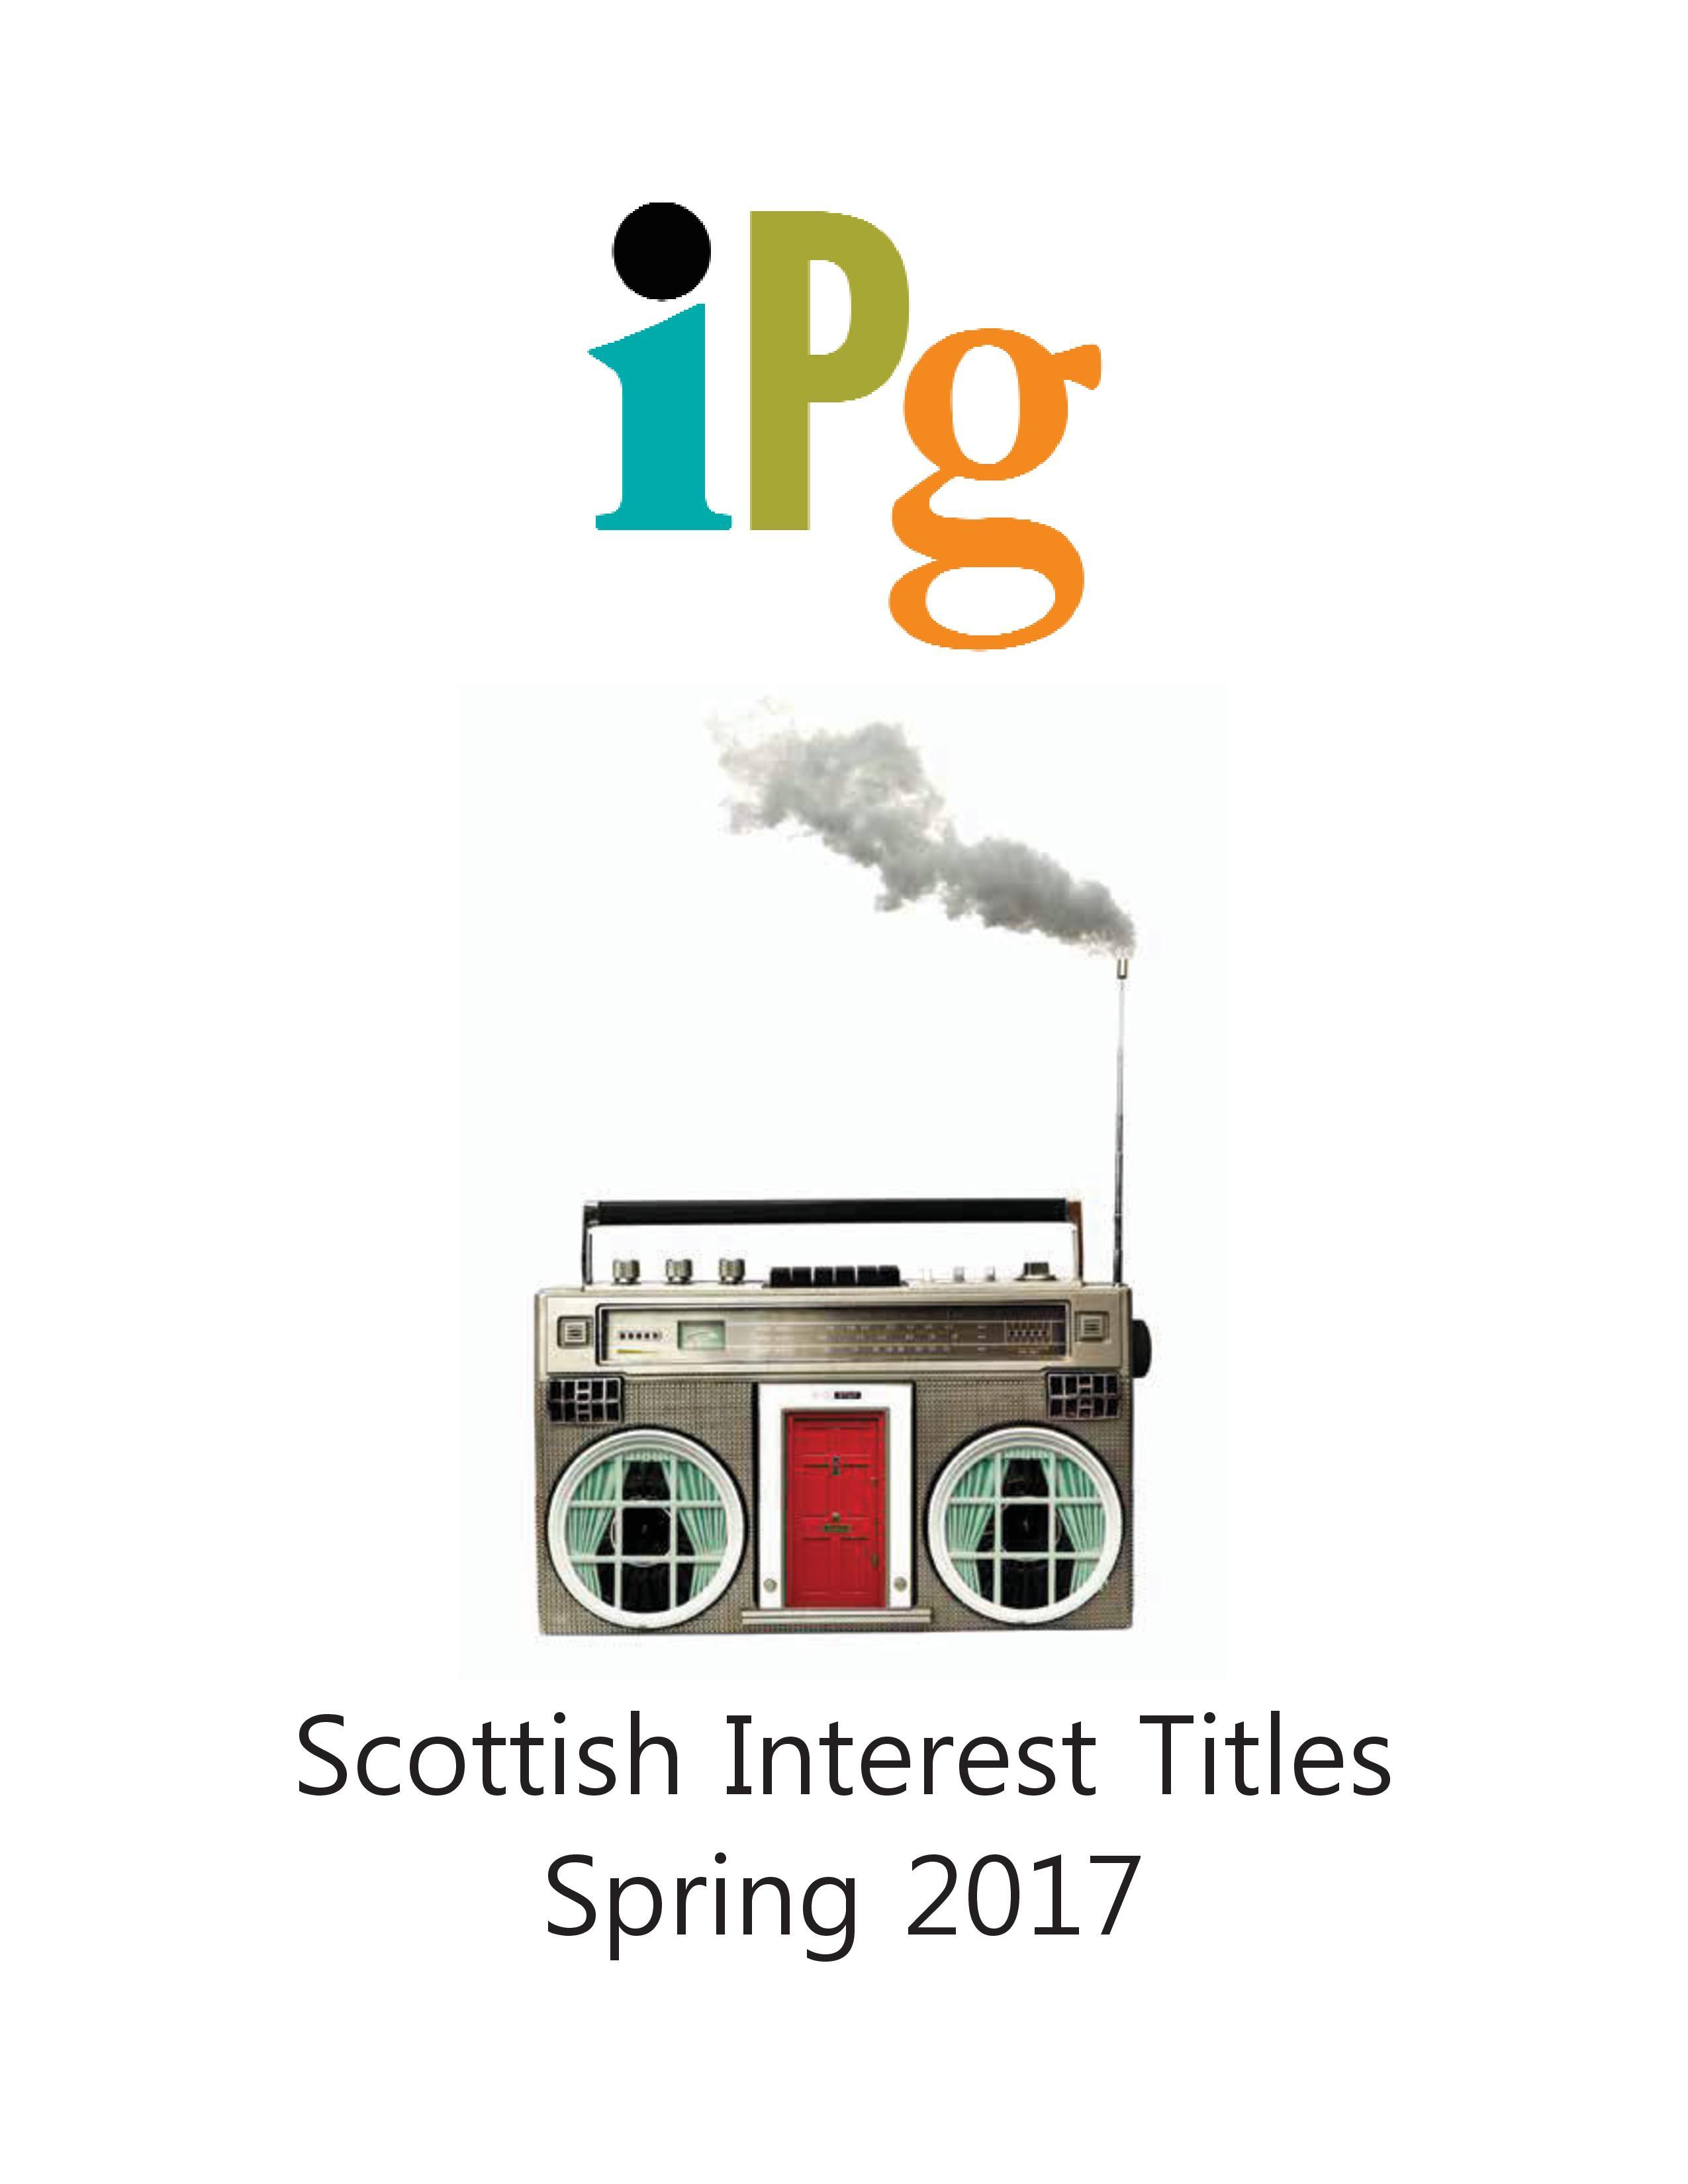 Scottish Interest Titles